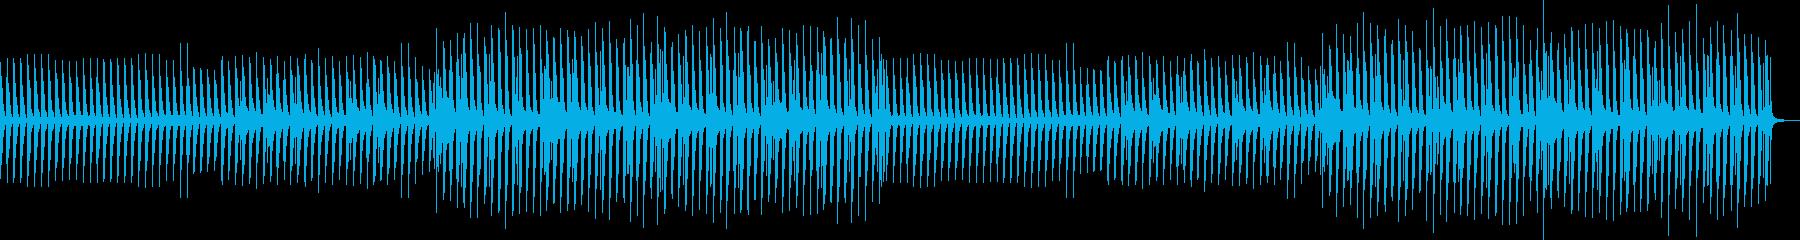 Background Piano Popの再生済みの波形